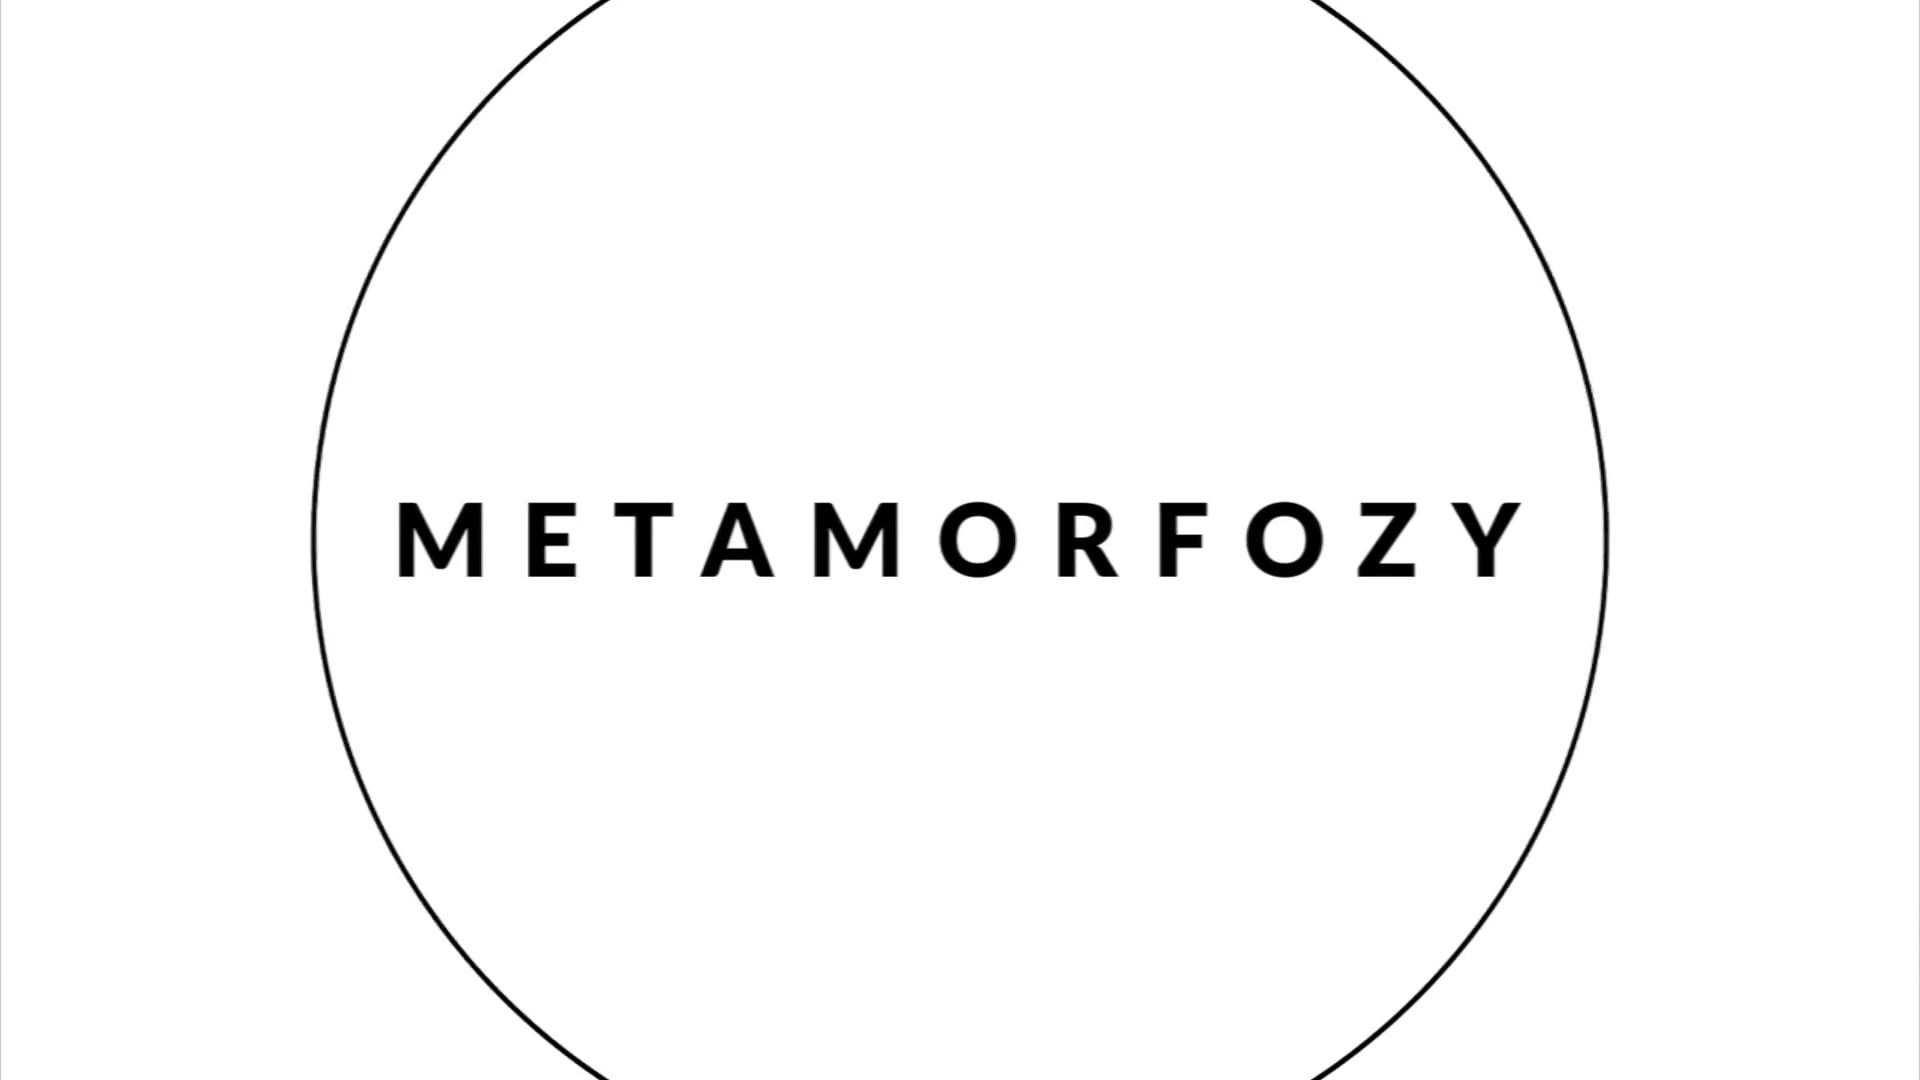 METAMORPHOSIS BY UNEEL@ONMOVE EPISODE 2